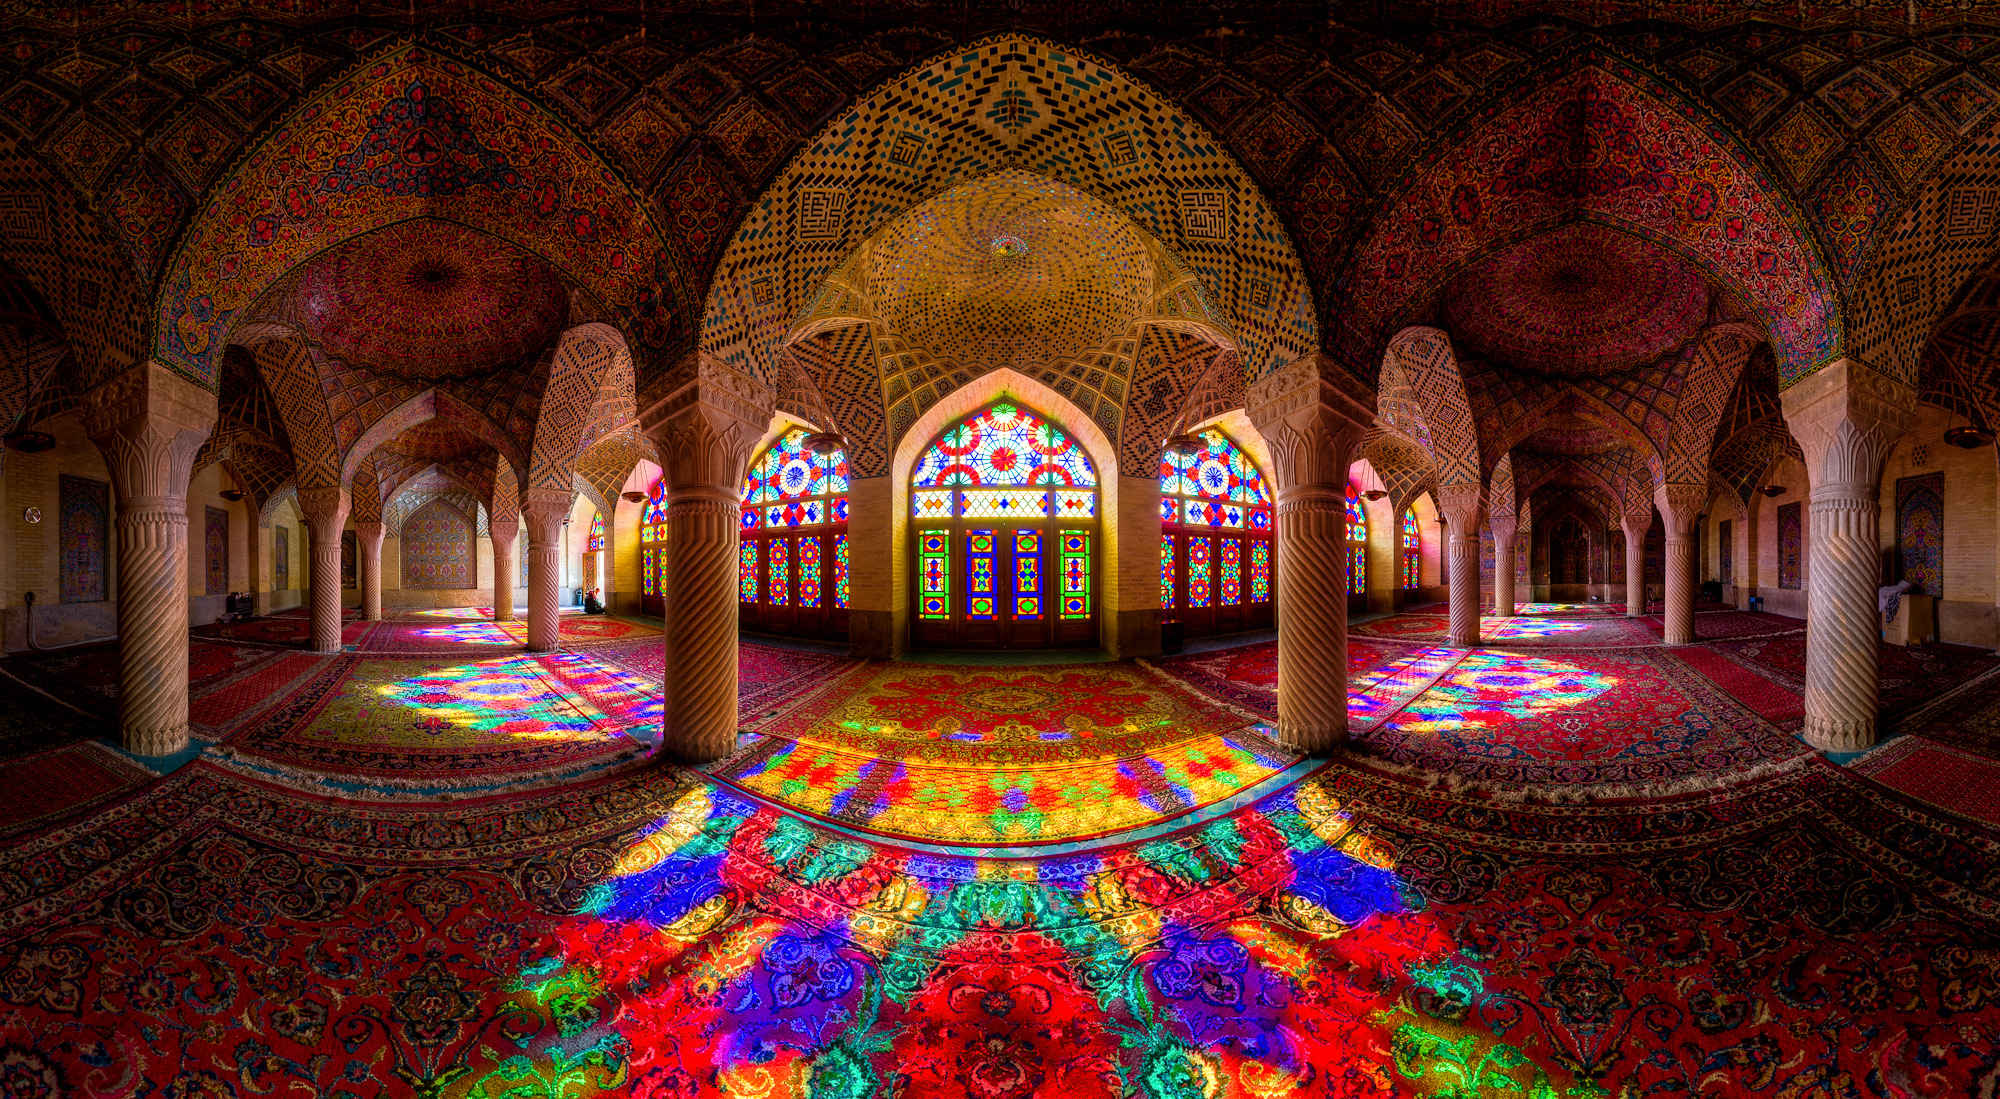 Nasir-almulk-mosque - located in Shiraz.jpg